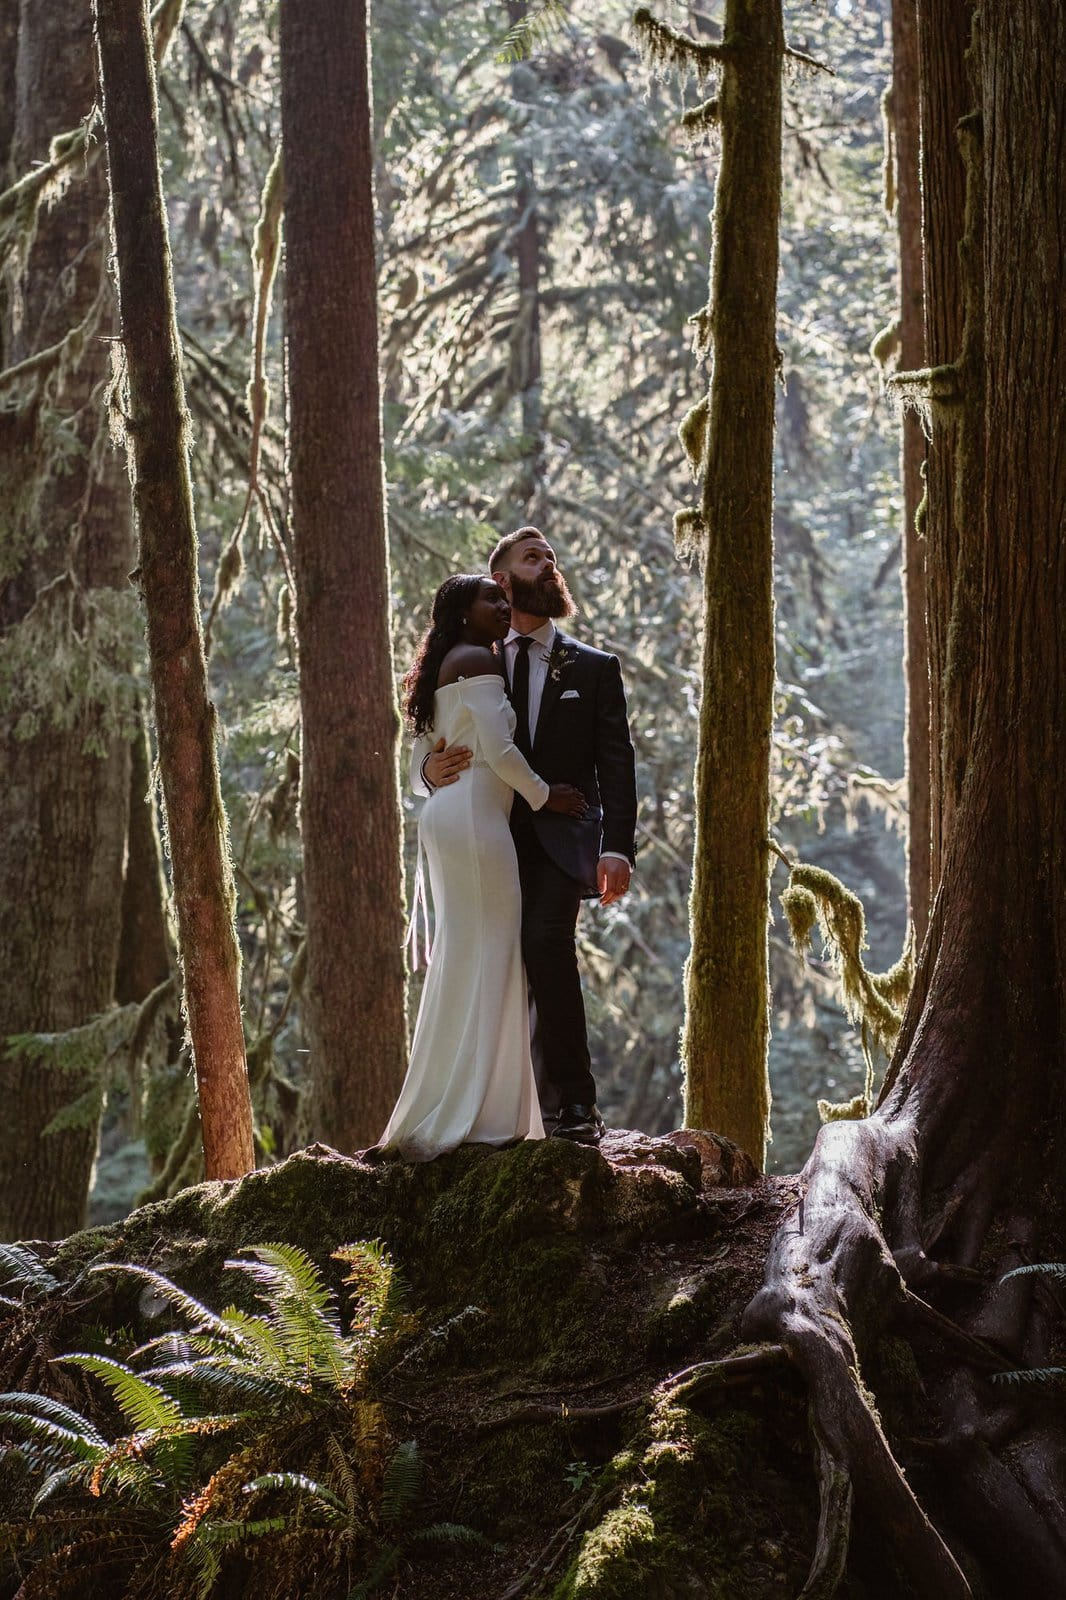 Intimate wedding in Washington's Olympic National Park.